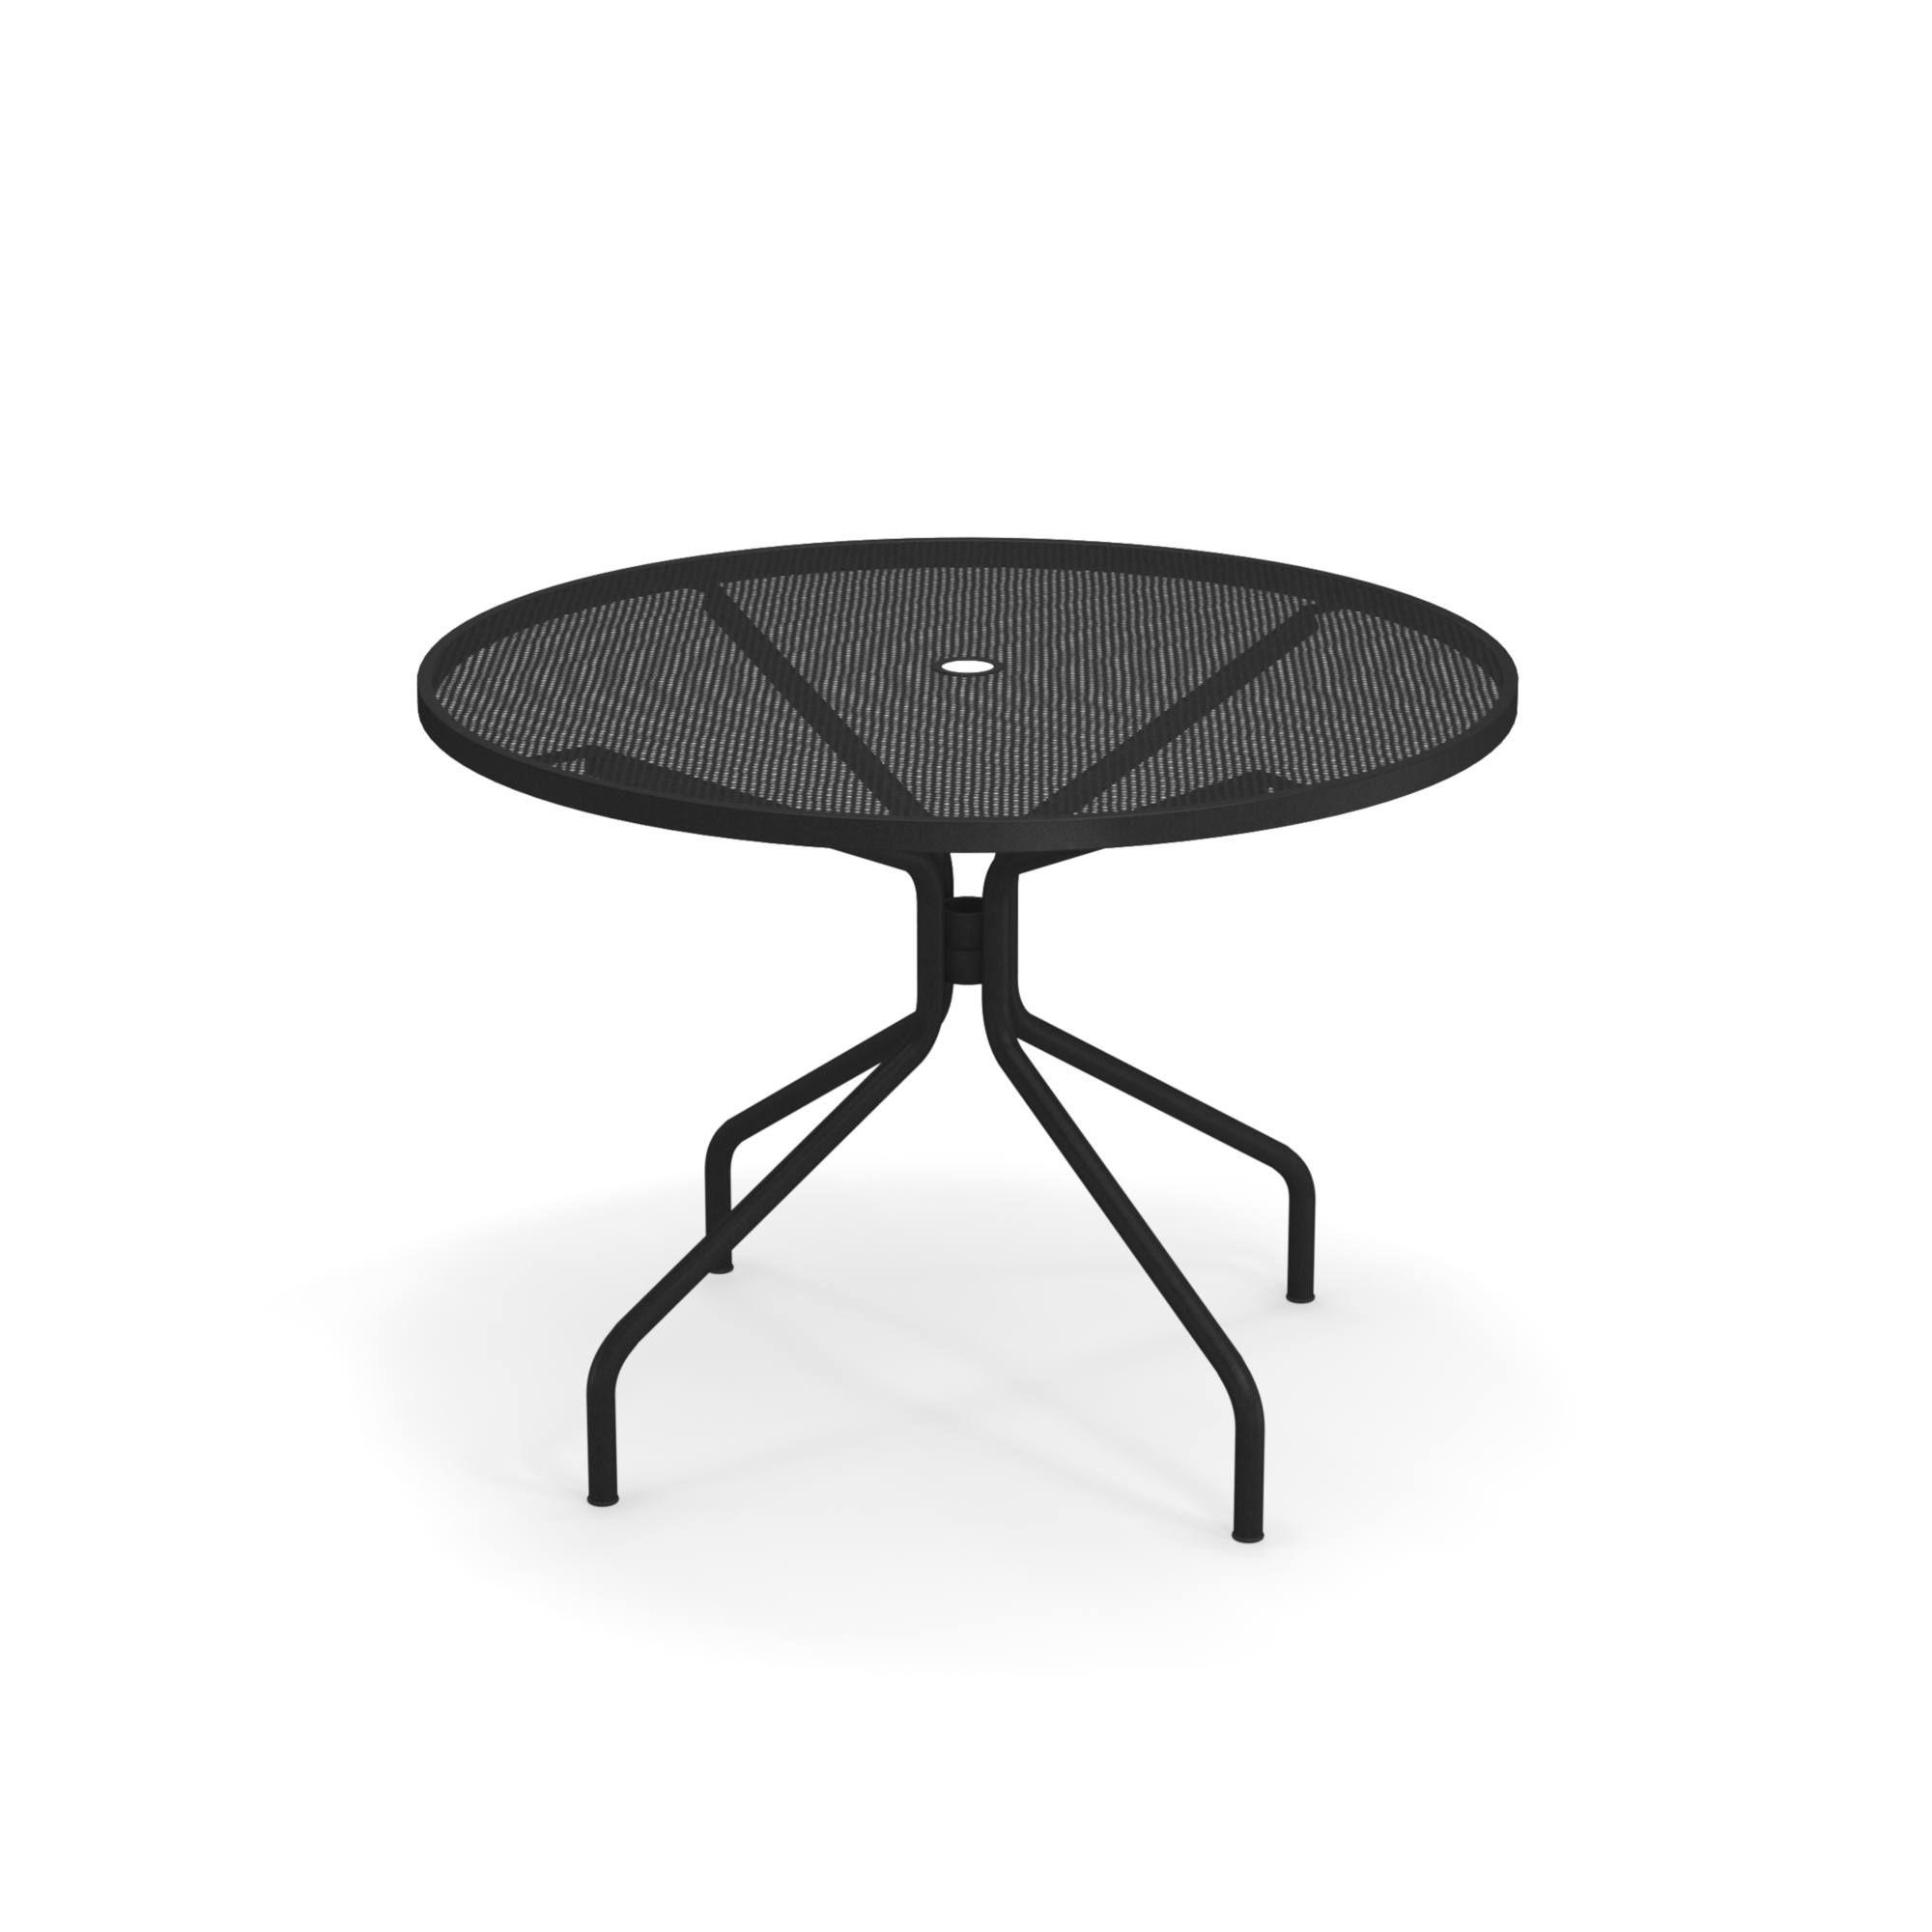 emuamericas, llc 813-24 table, outdoor